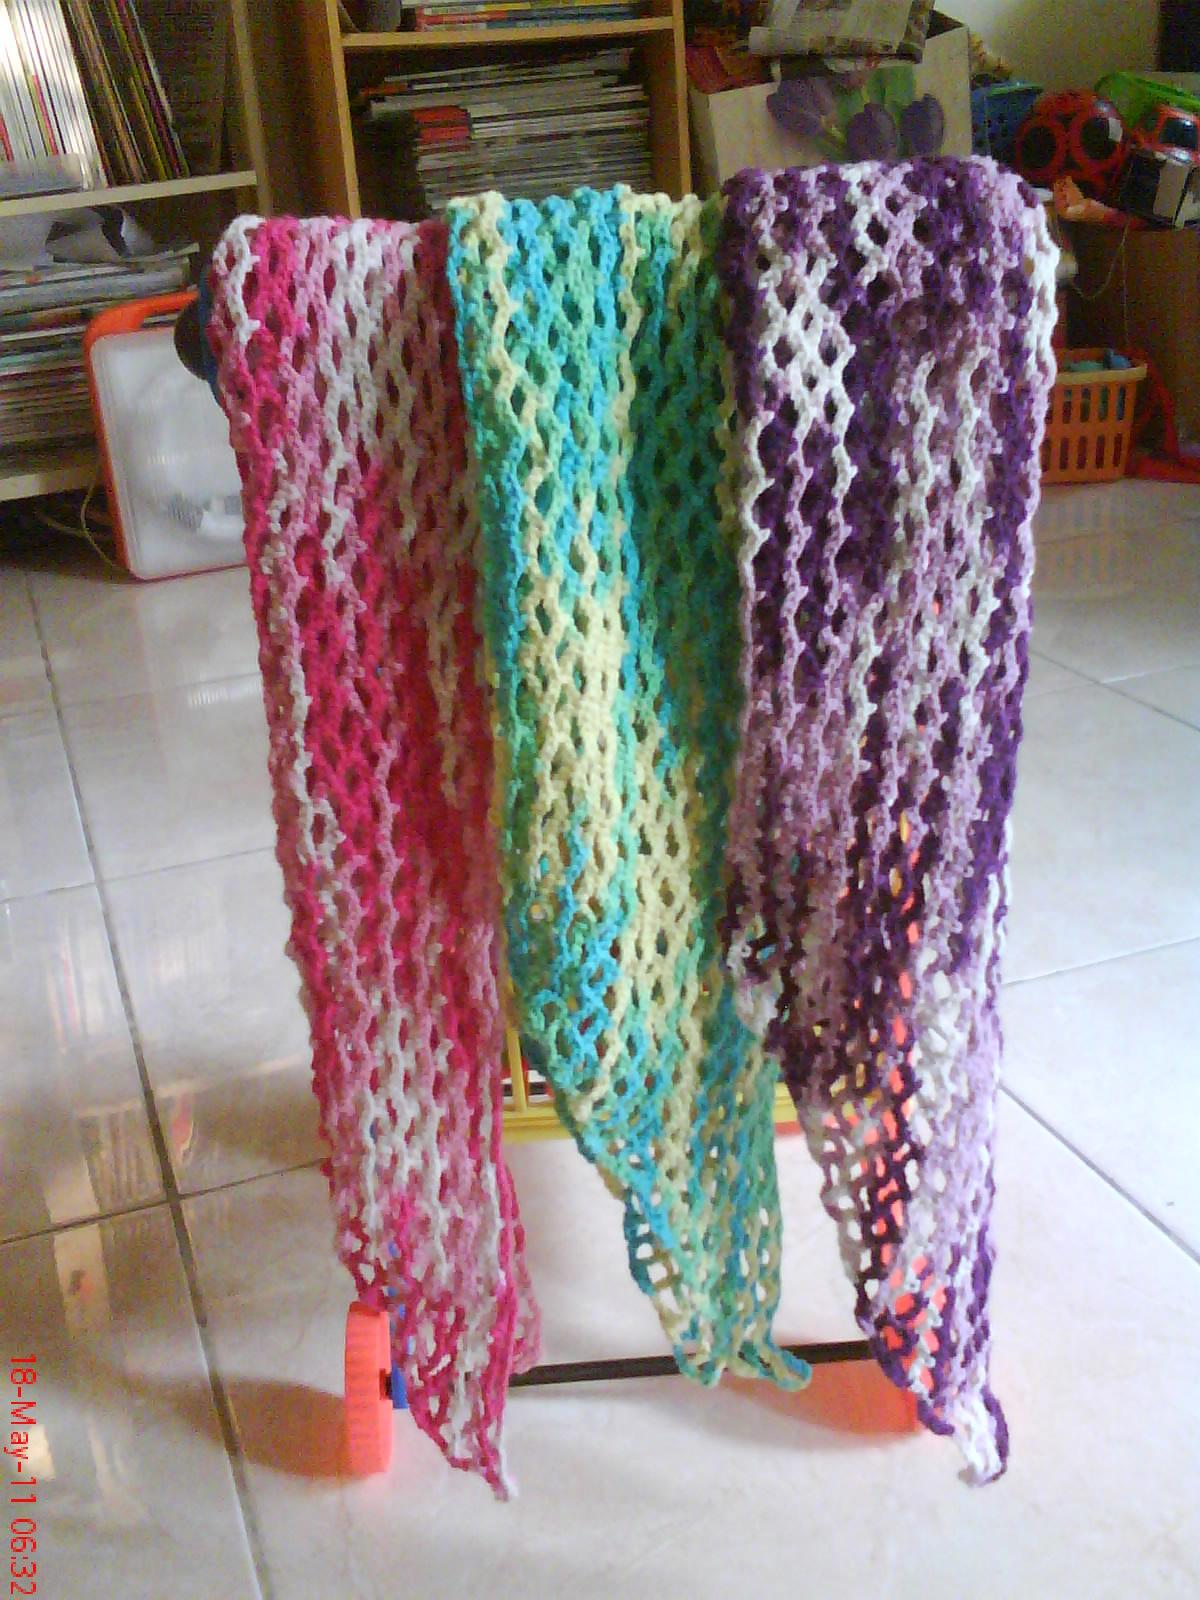 Knitted Artinya : Bros rajut crochet brooch knitting and crocheting